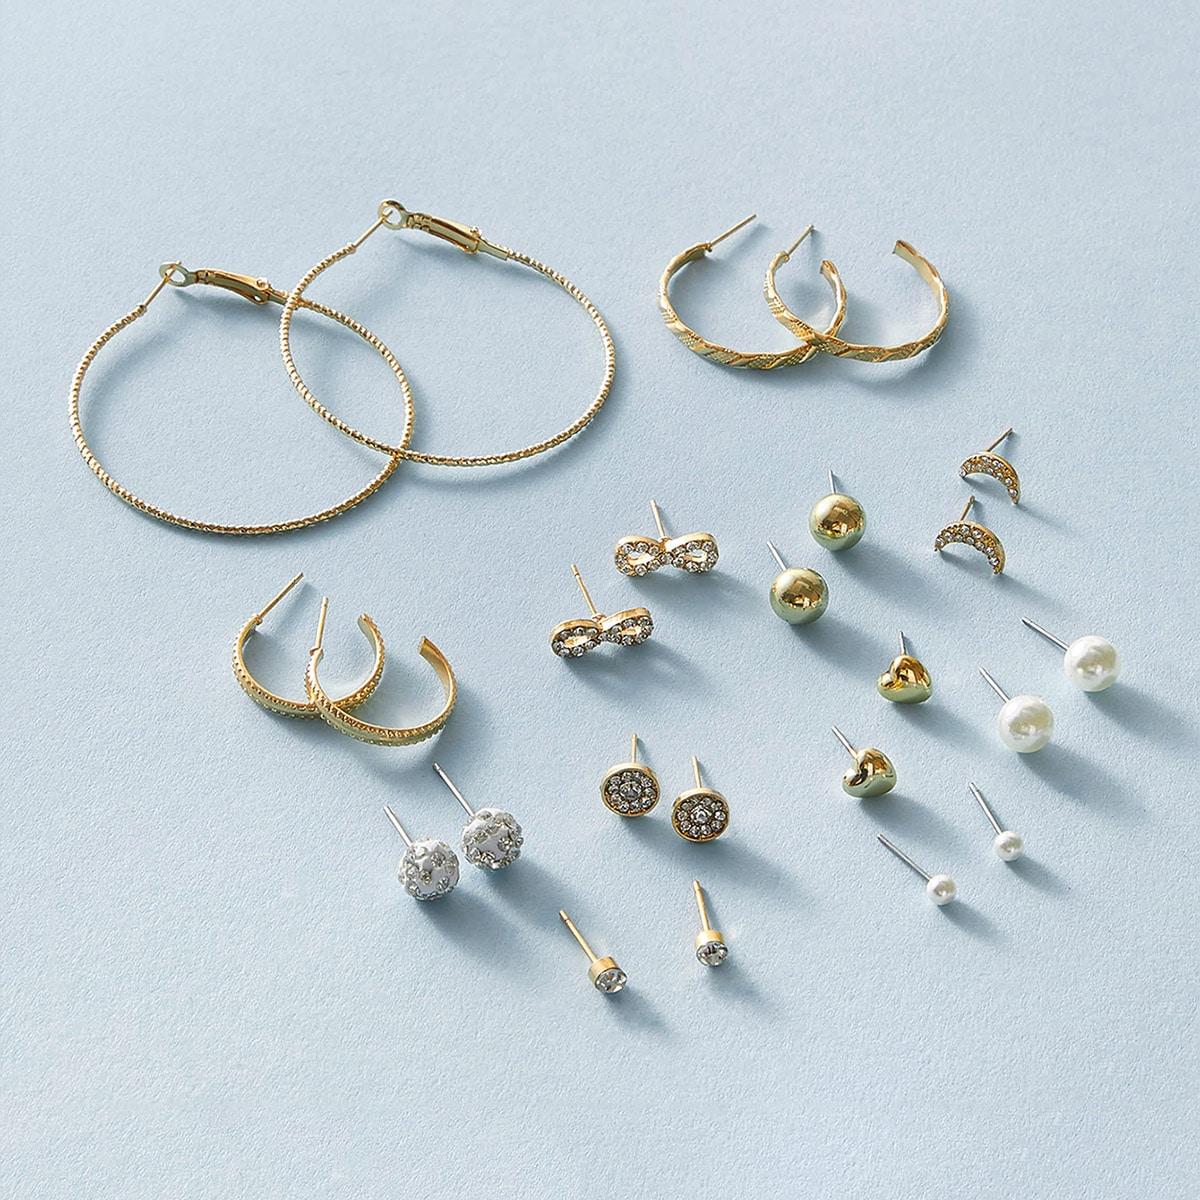 12pairs Faux Pearl & Heart Decor Earrings